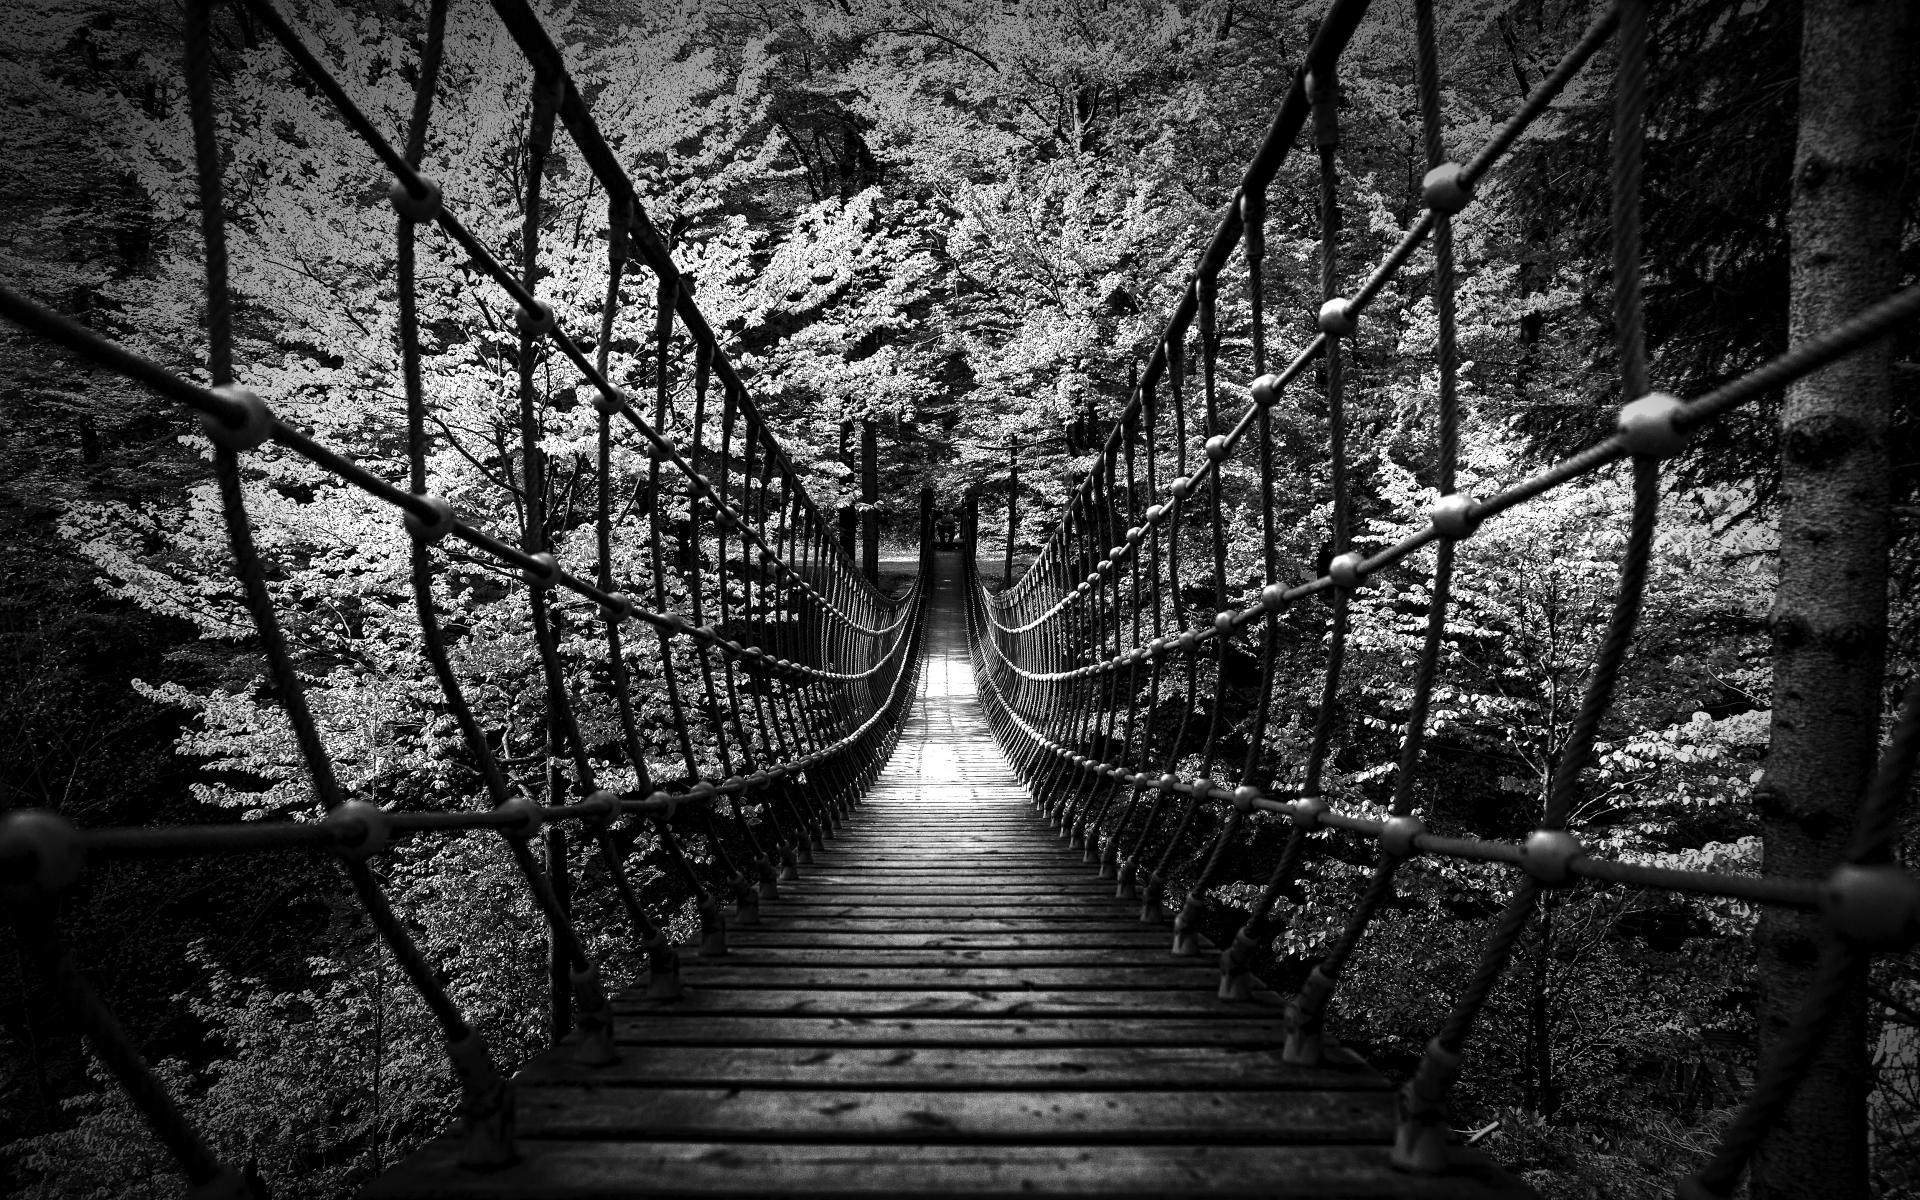 monochrome black white bw landscapes nature wood rope